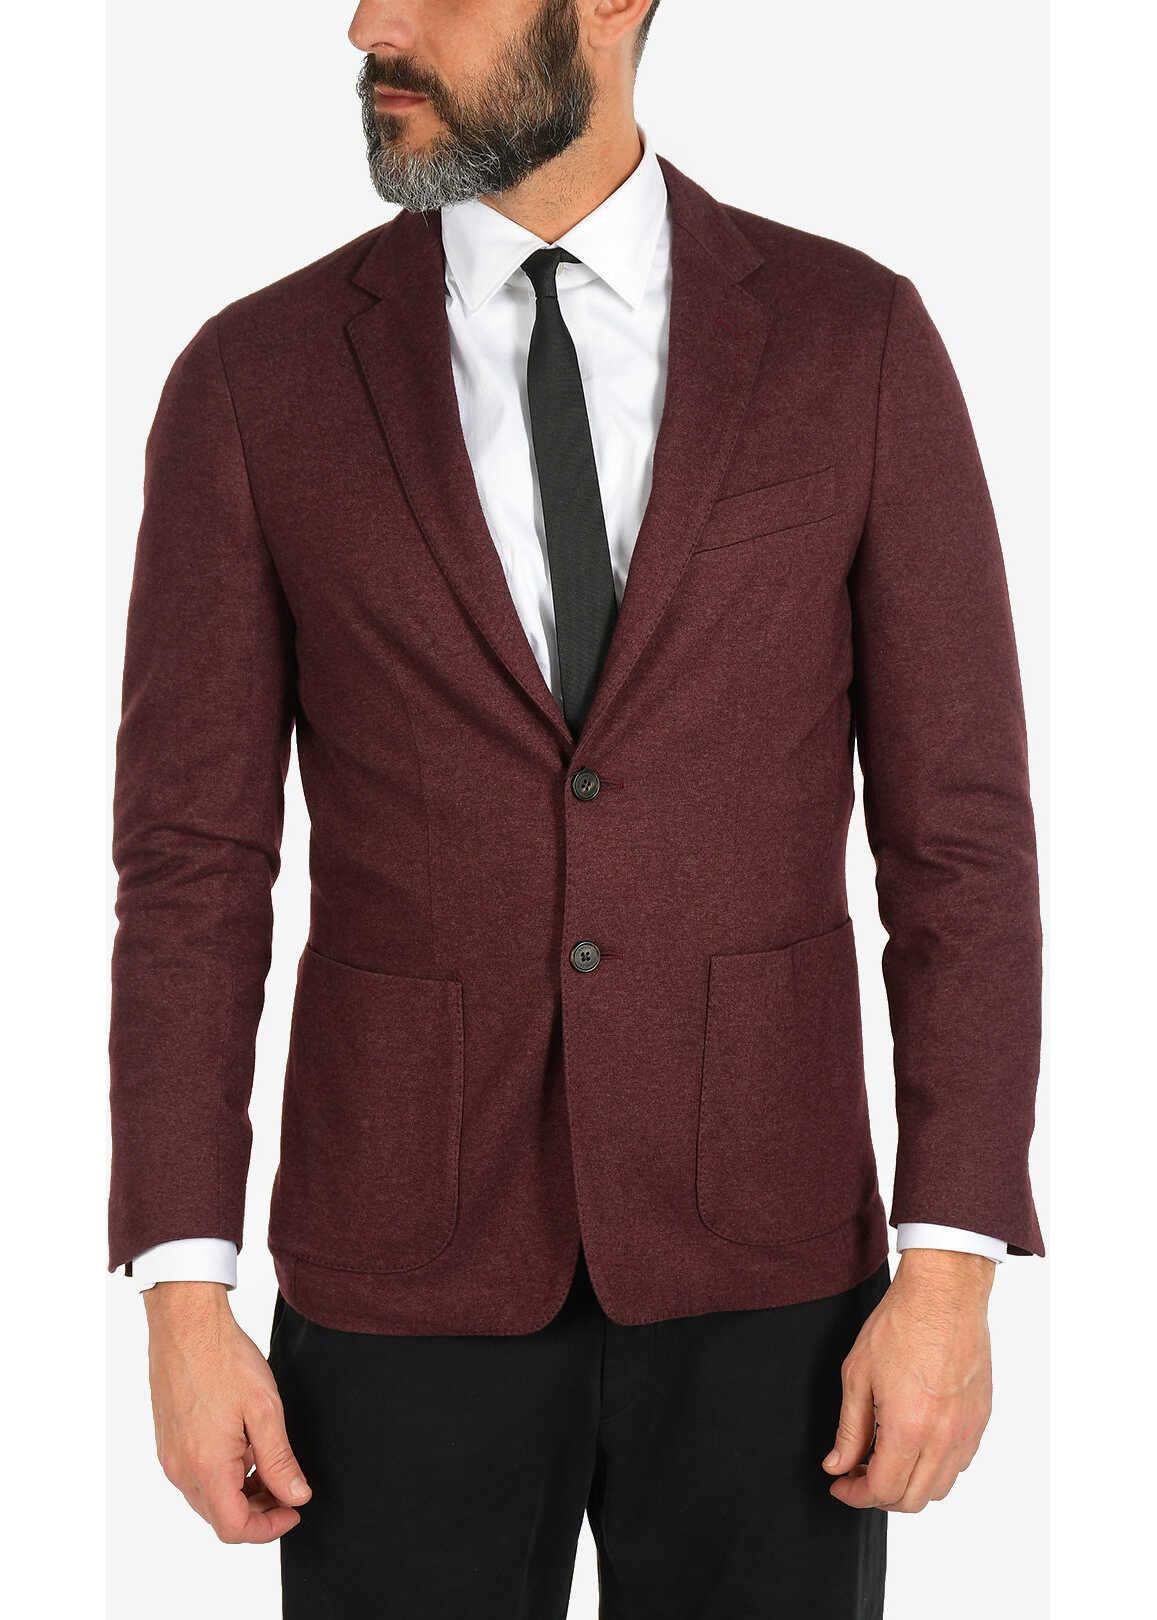 CORNELIANI ID silk and cashmere 2-button blazer BURGUNDY imagine